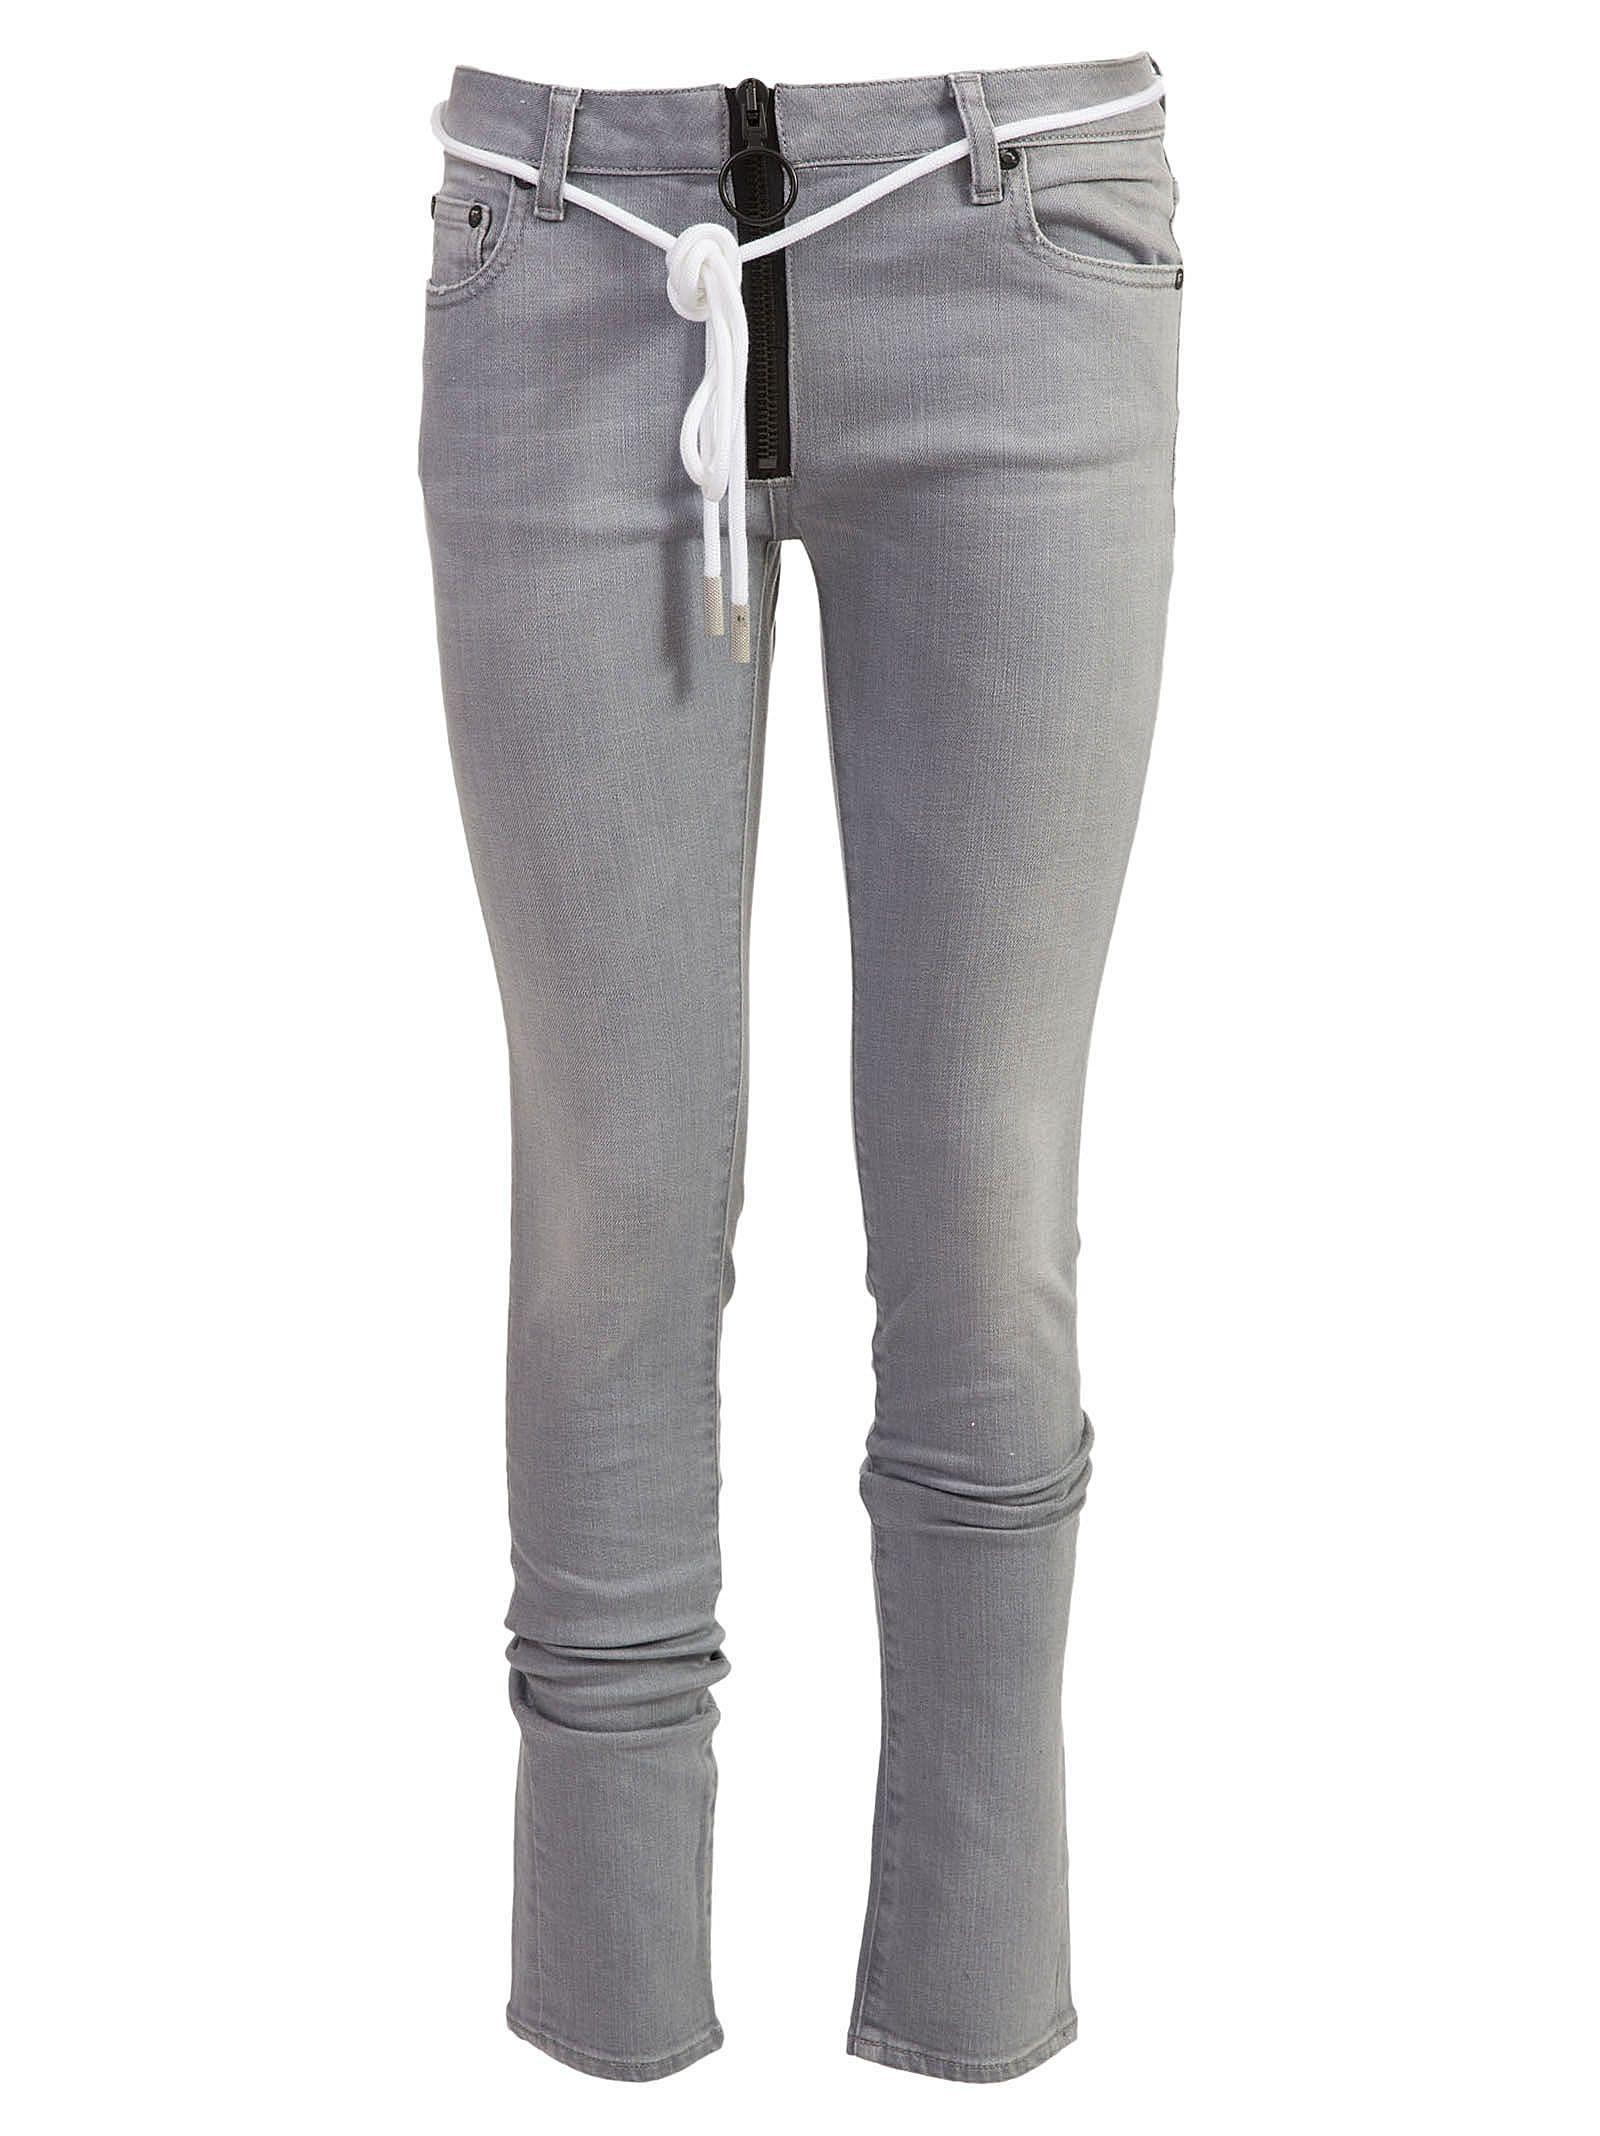 Off-white Striped Trim Jeans